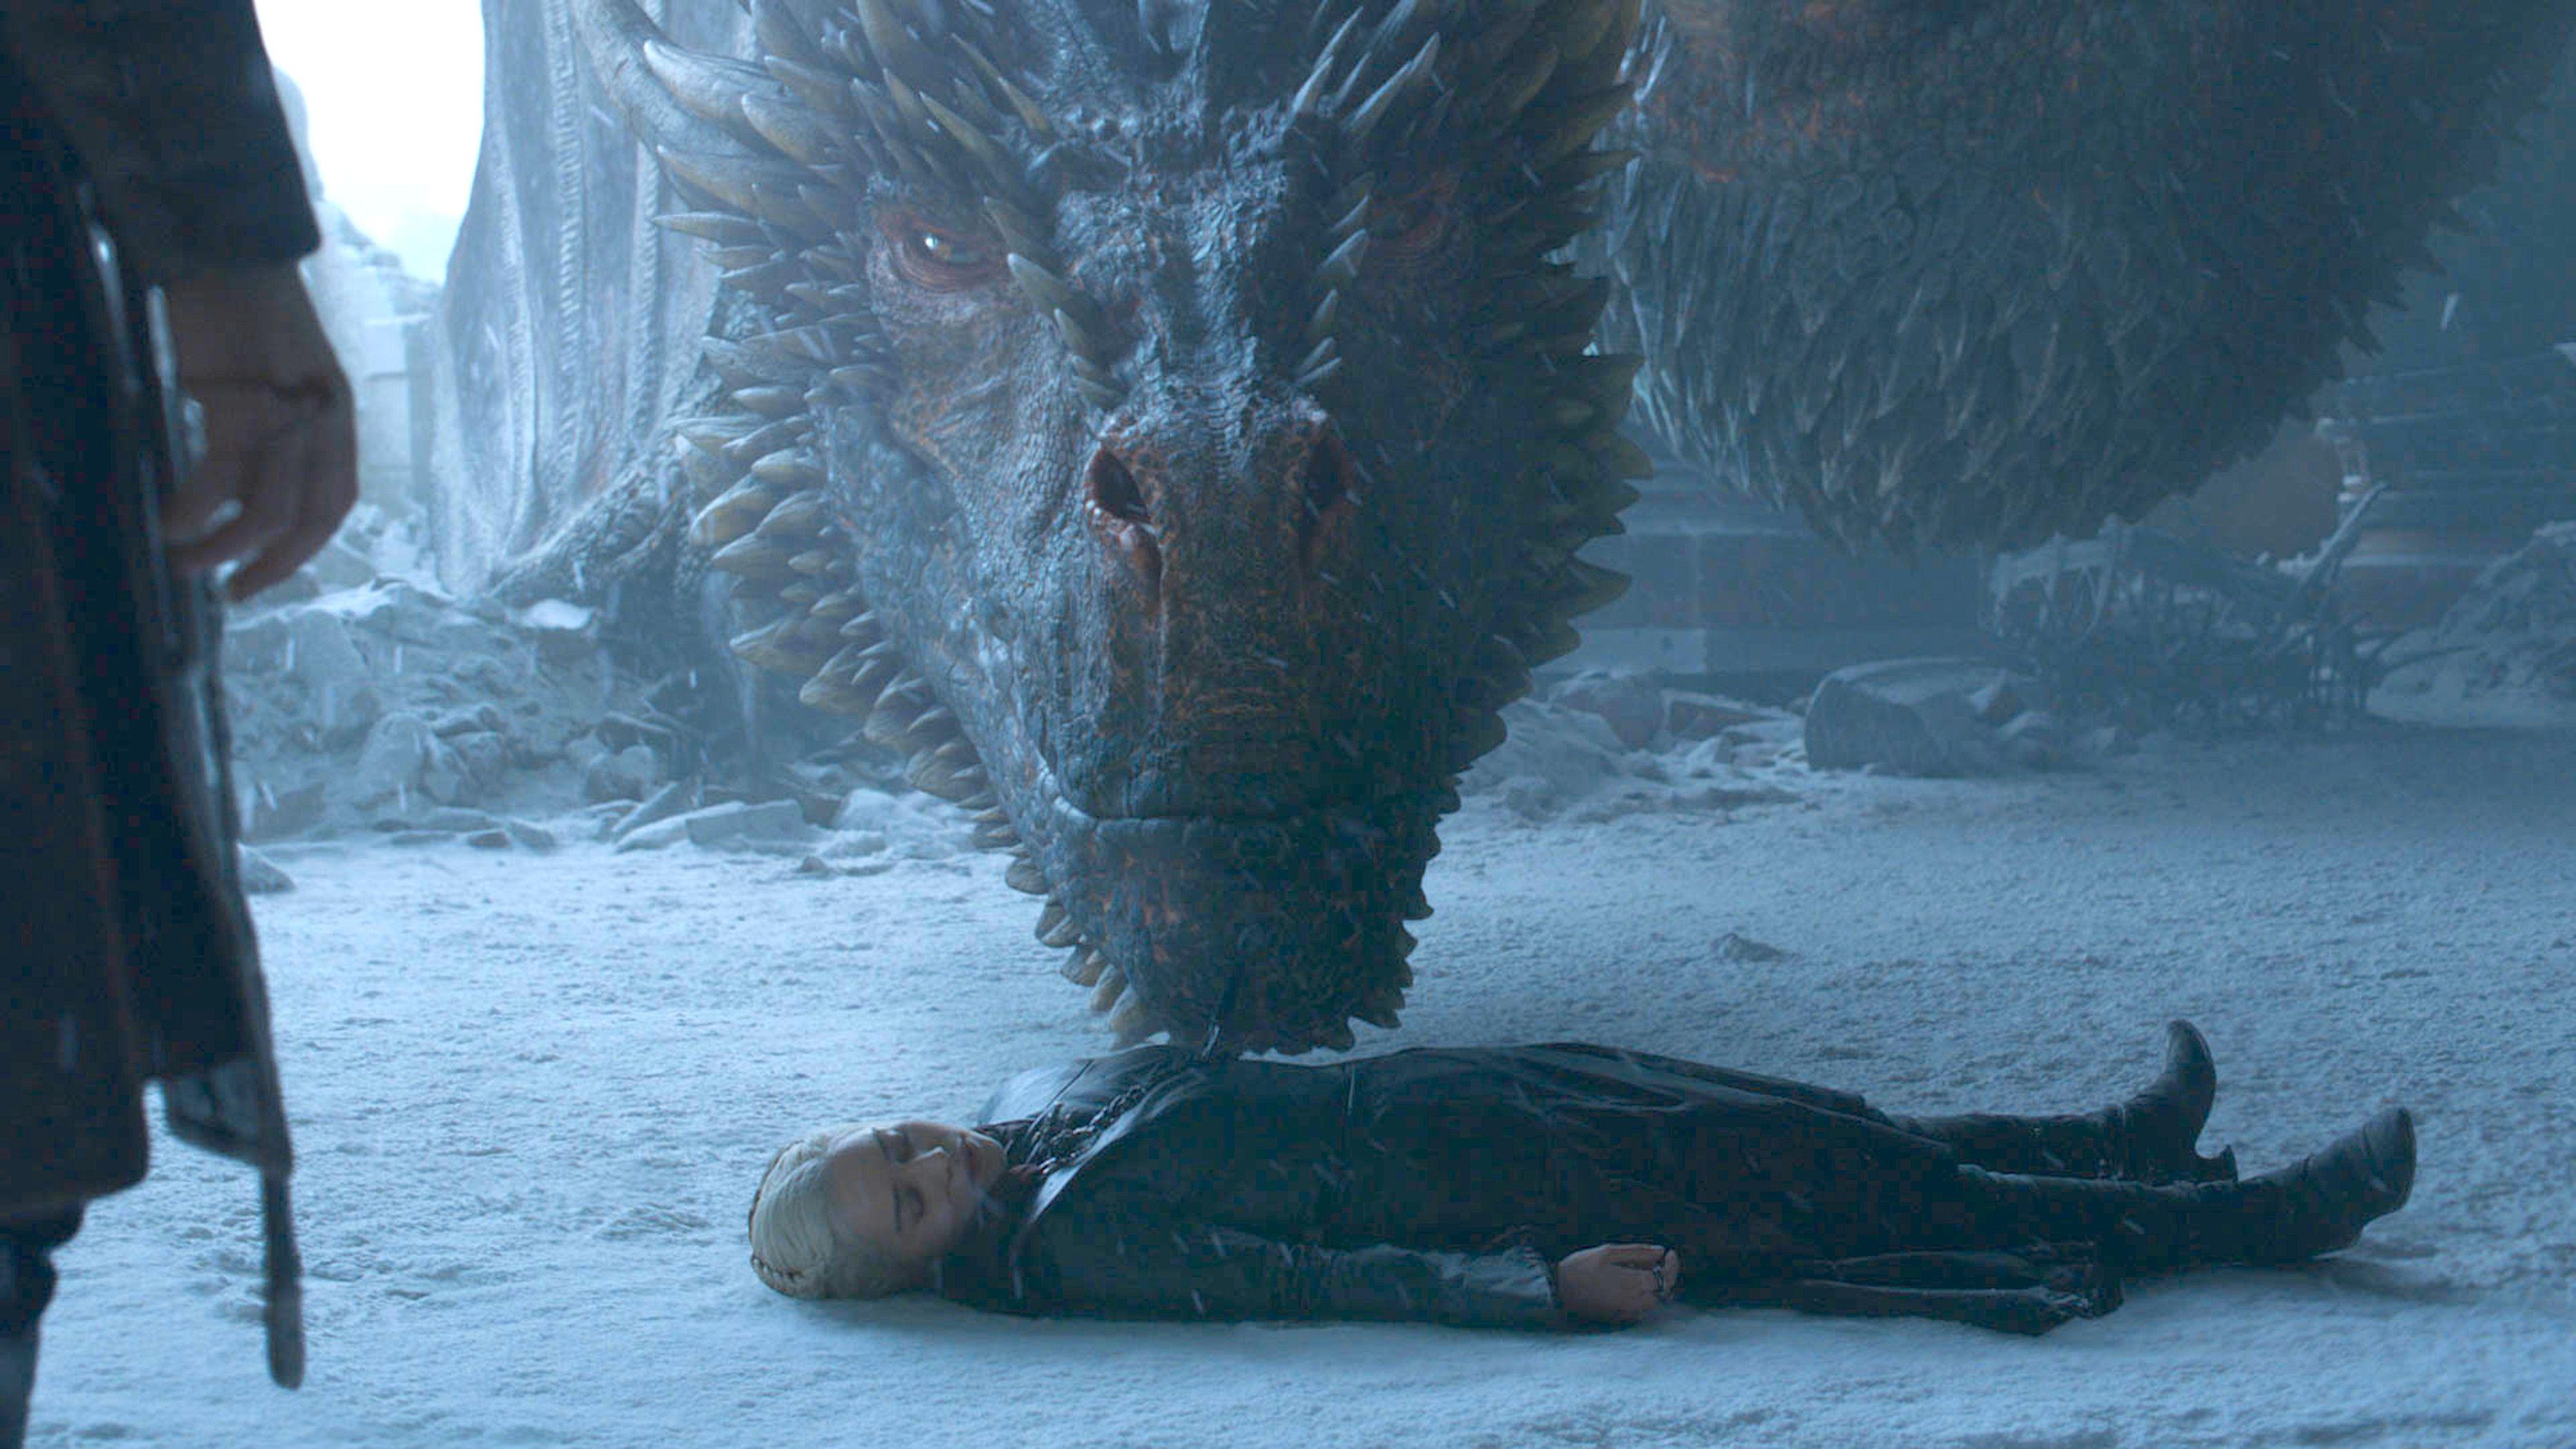 Game of Thrones Daenerys Resurrection Fan Theory - Is Drogon